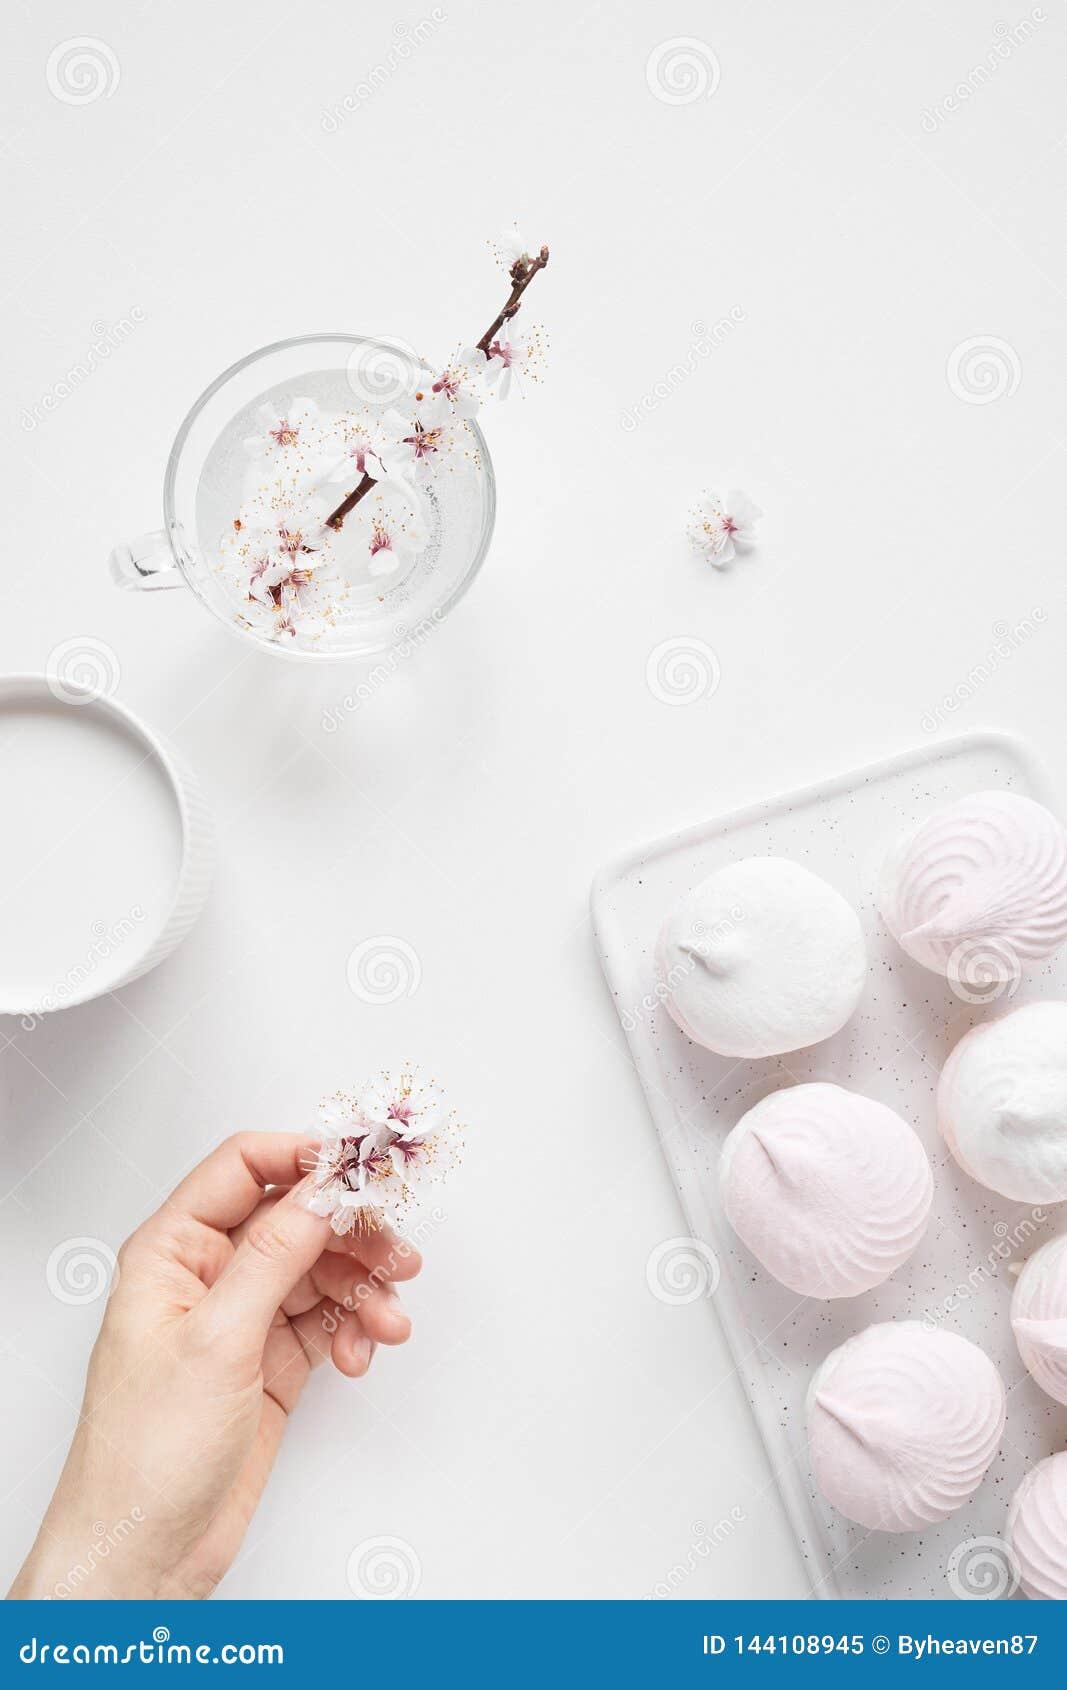 Zéfiro e flores no branco liso